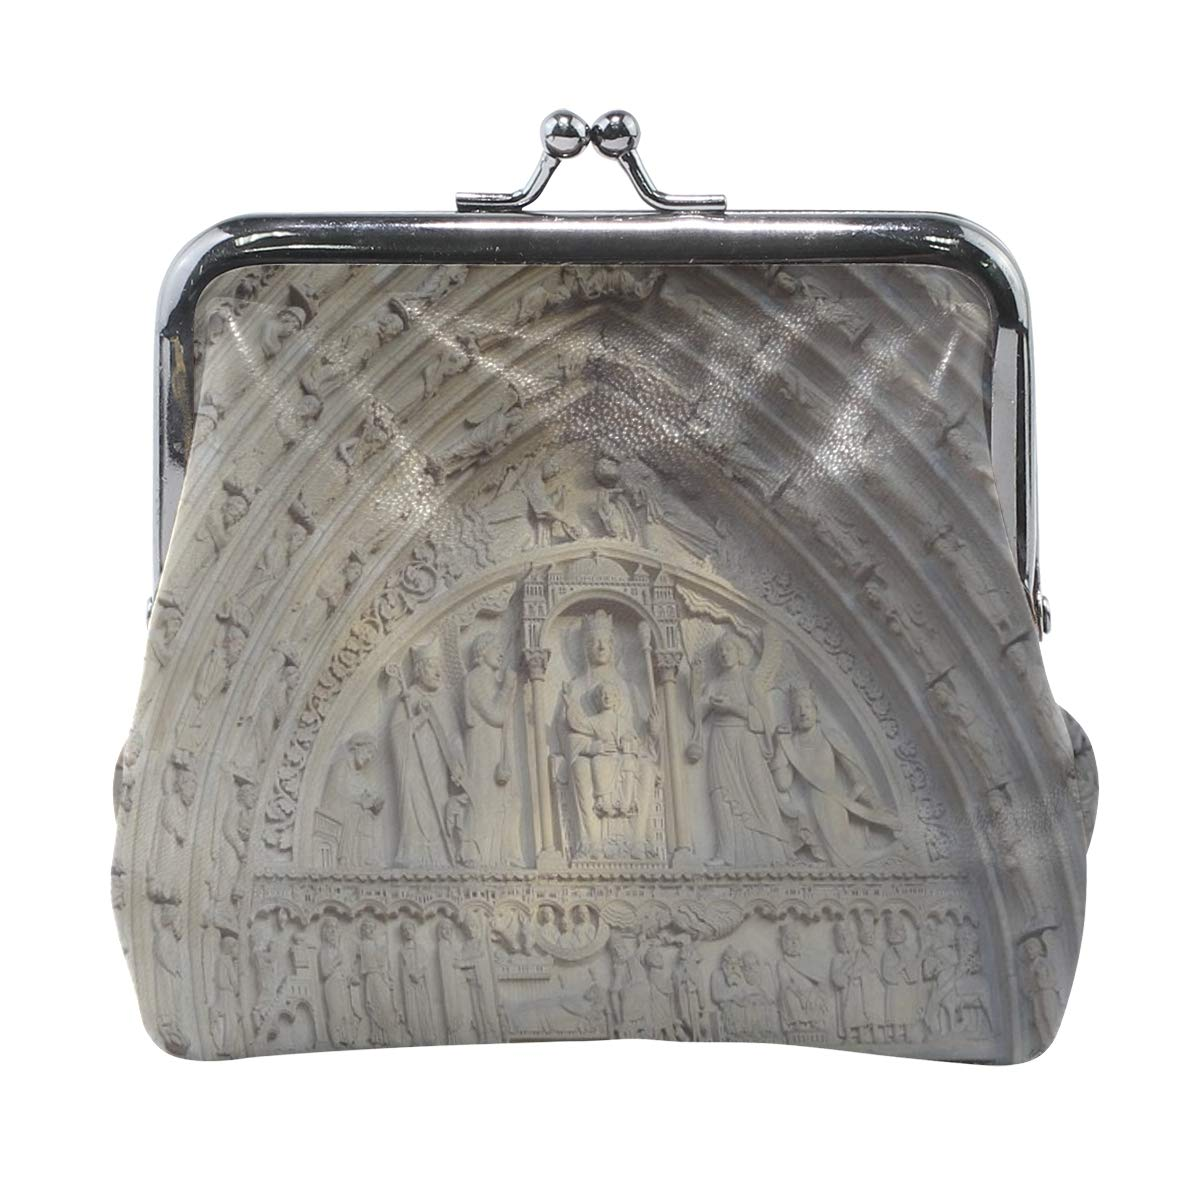 Rh Studio Coin Purse Clasp Closure Notre Dame Cathedral Paris France Print Wallet Exquisite Coin Pouch Girls Women Clutch Handbag Exquisite Gift